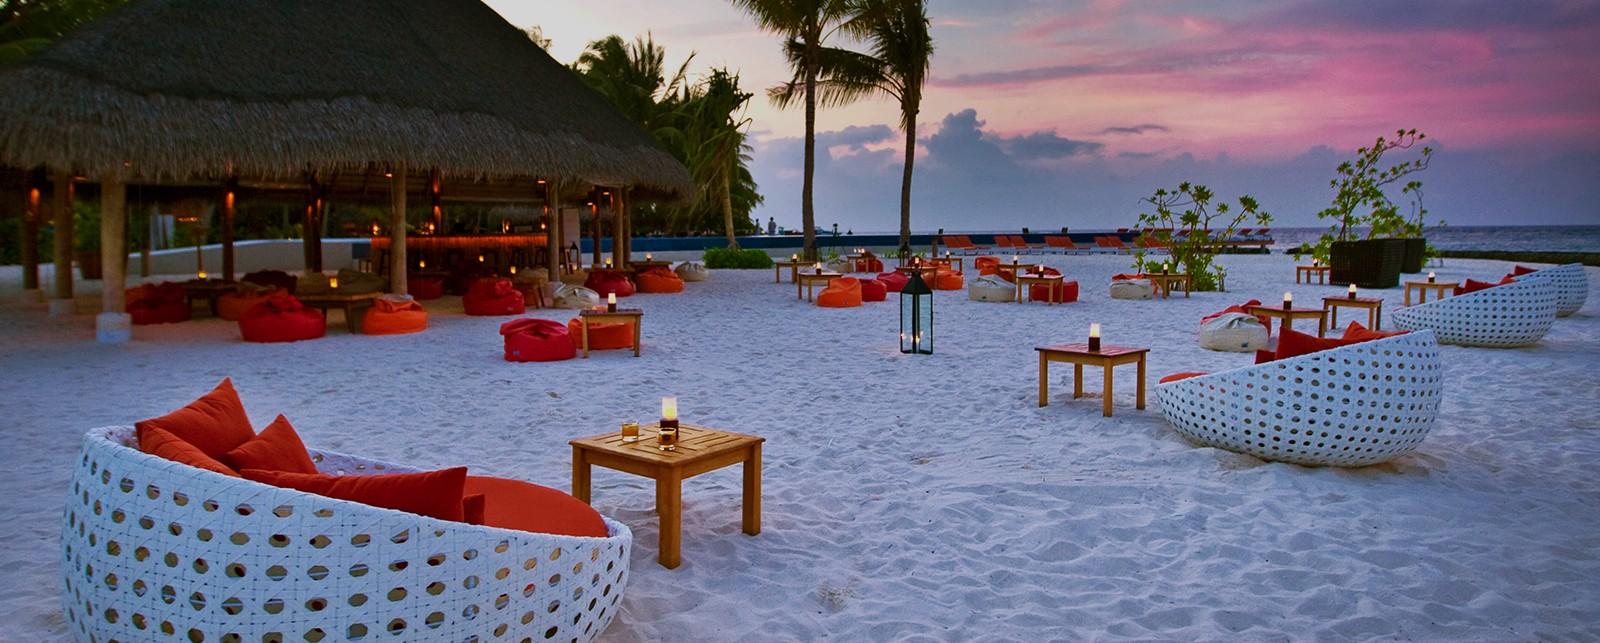 kuramathi maldives all inclusive luxury honeymoon dreams honeymoon dreams. Black Bedroom Furniture Sets. Home Design Ideas